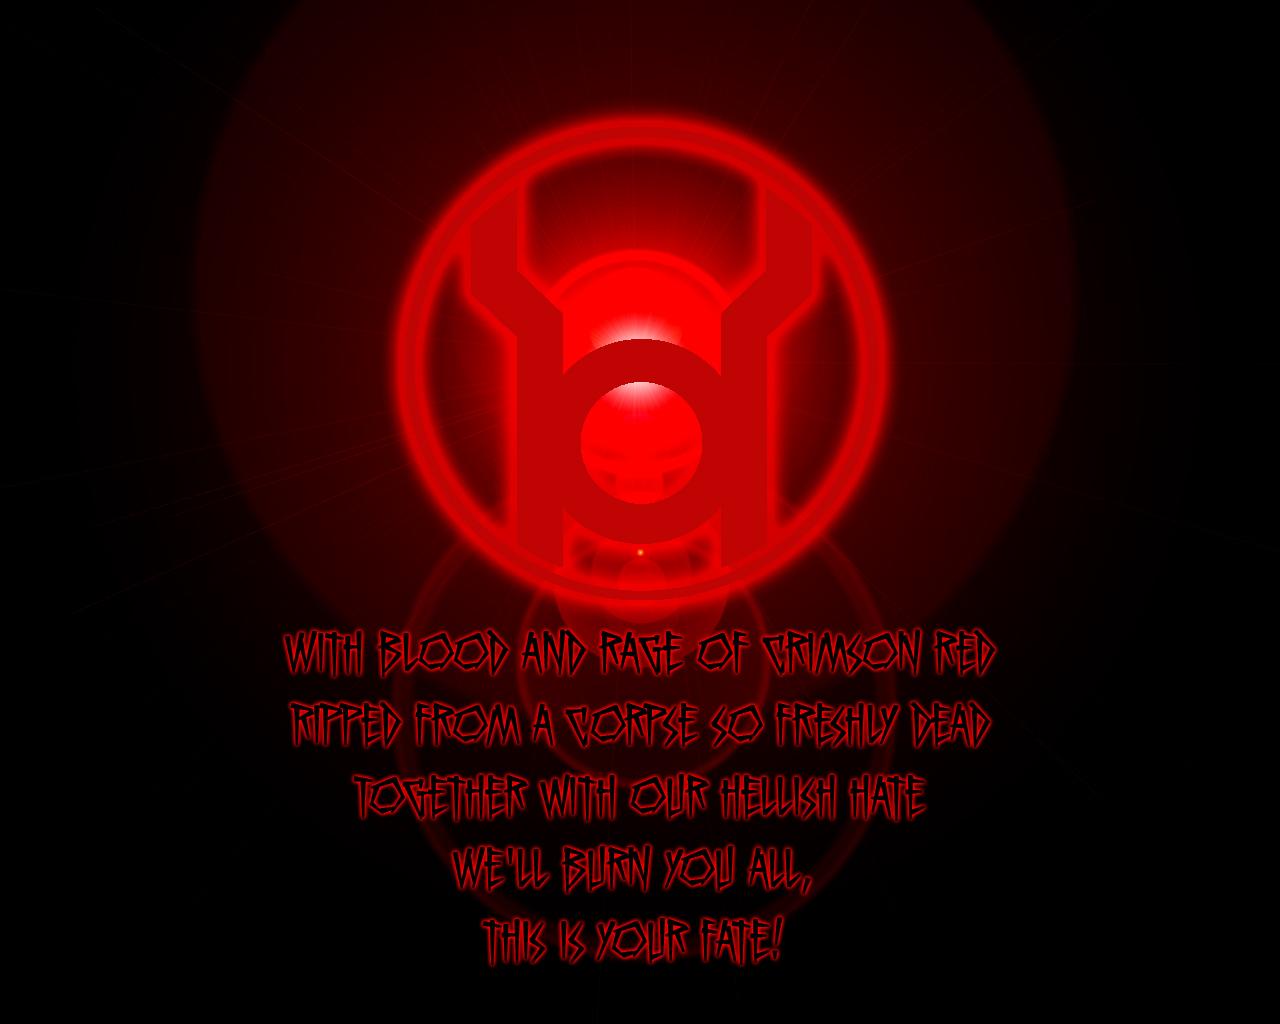 DC Comics Wallpaper 1280x1024 DC Comics Red Lantern Corps 1280x1024